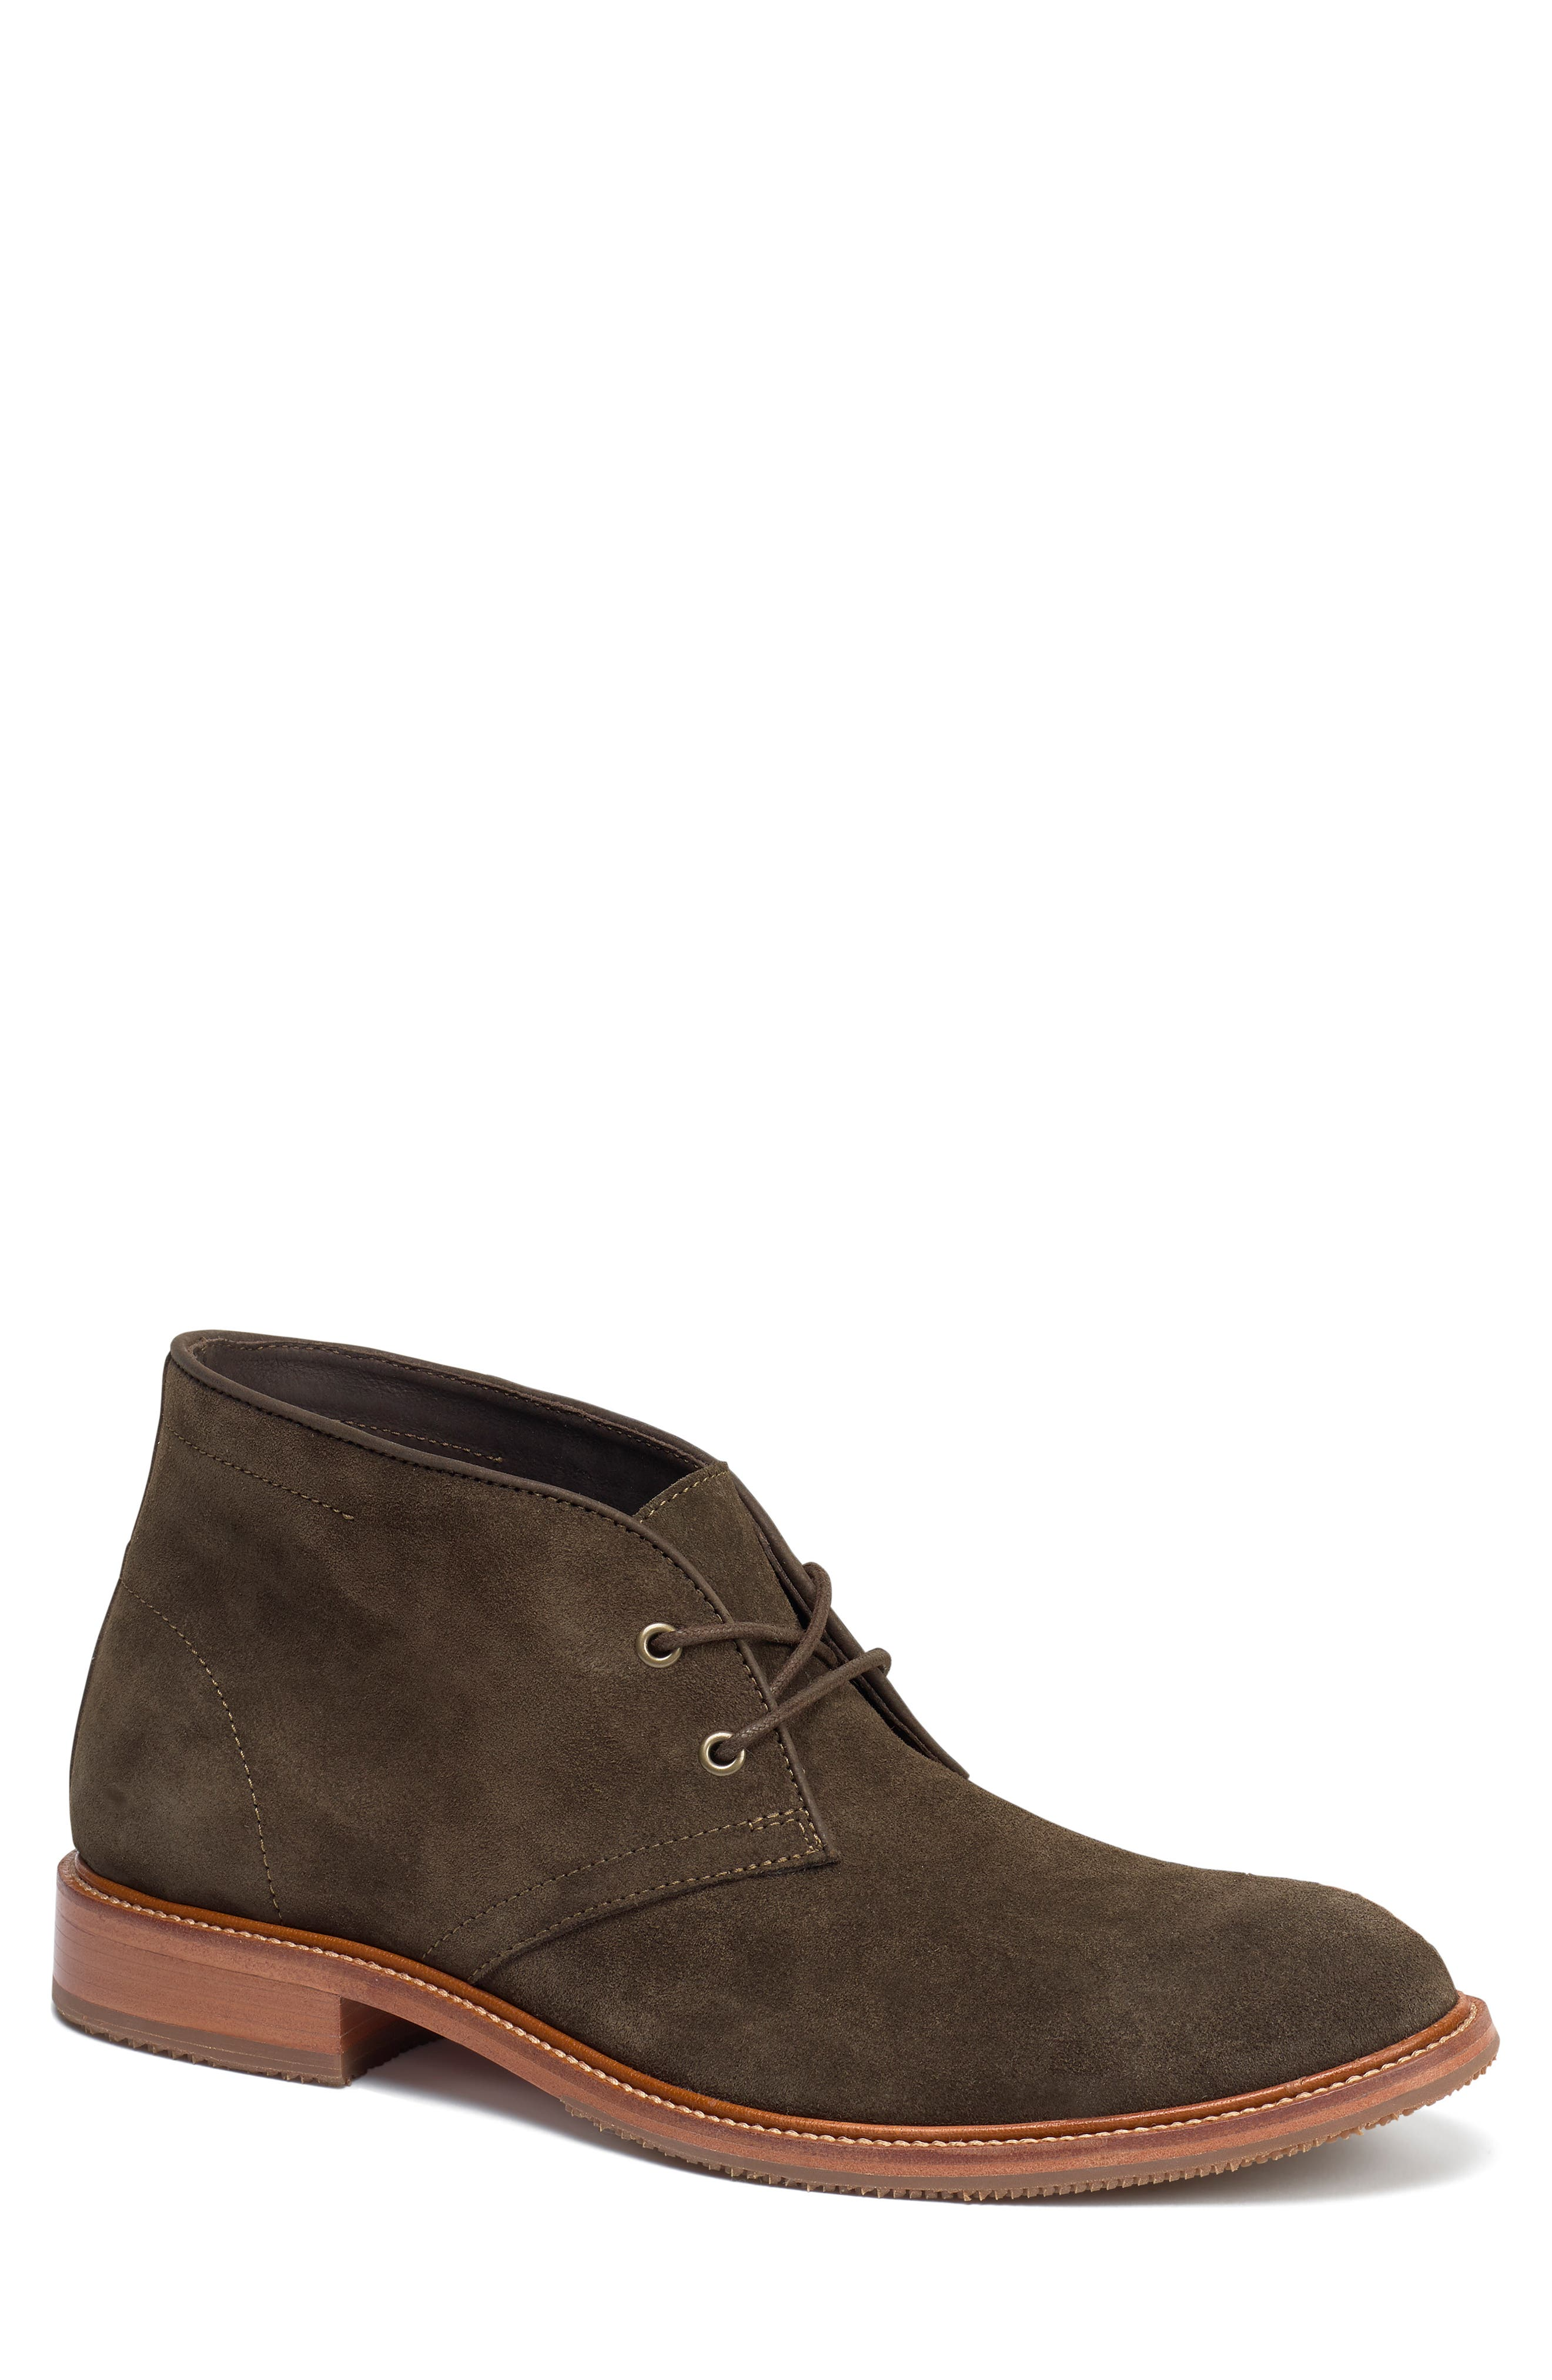 Trask Landers Chukka Boot, Green